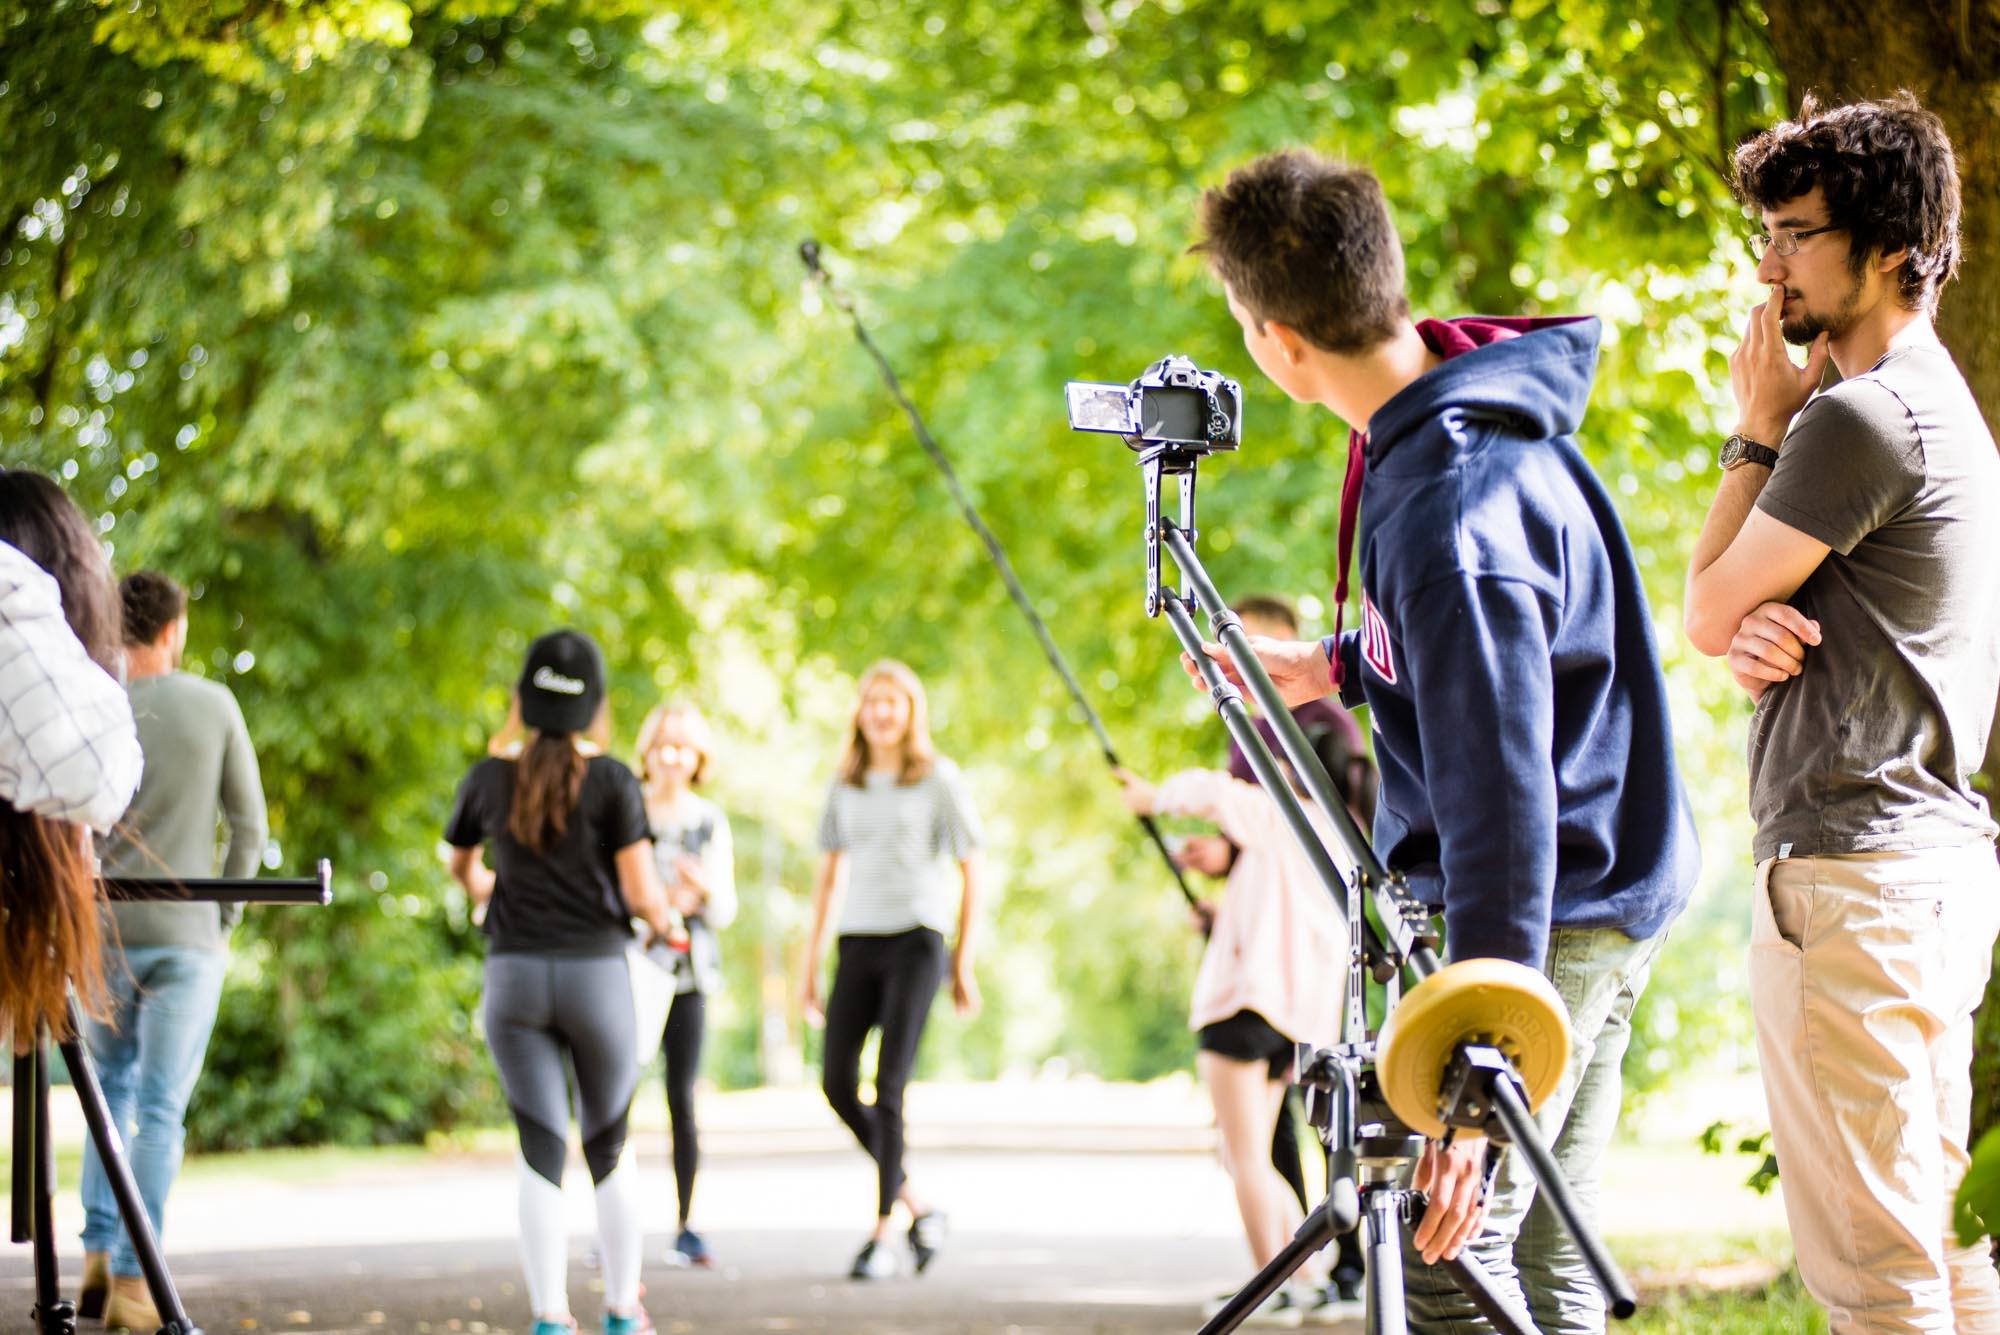 vasaros stovykla Bosworth, teniso vasaros stovykla, Filmu gamybos vasaros stovykla, kartingu vasaros stovykla, dailes ir darbu vasaros, anglu kalba bosvorte